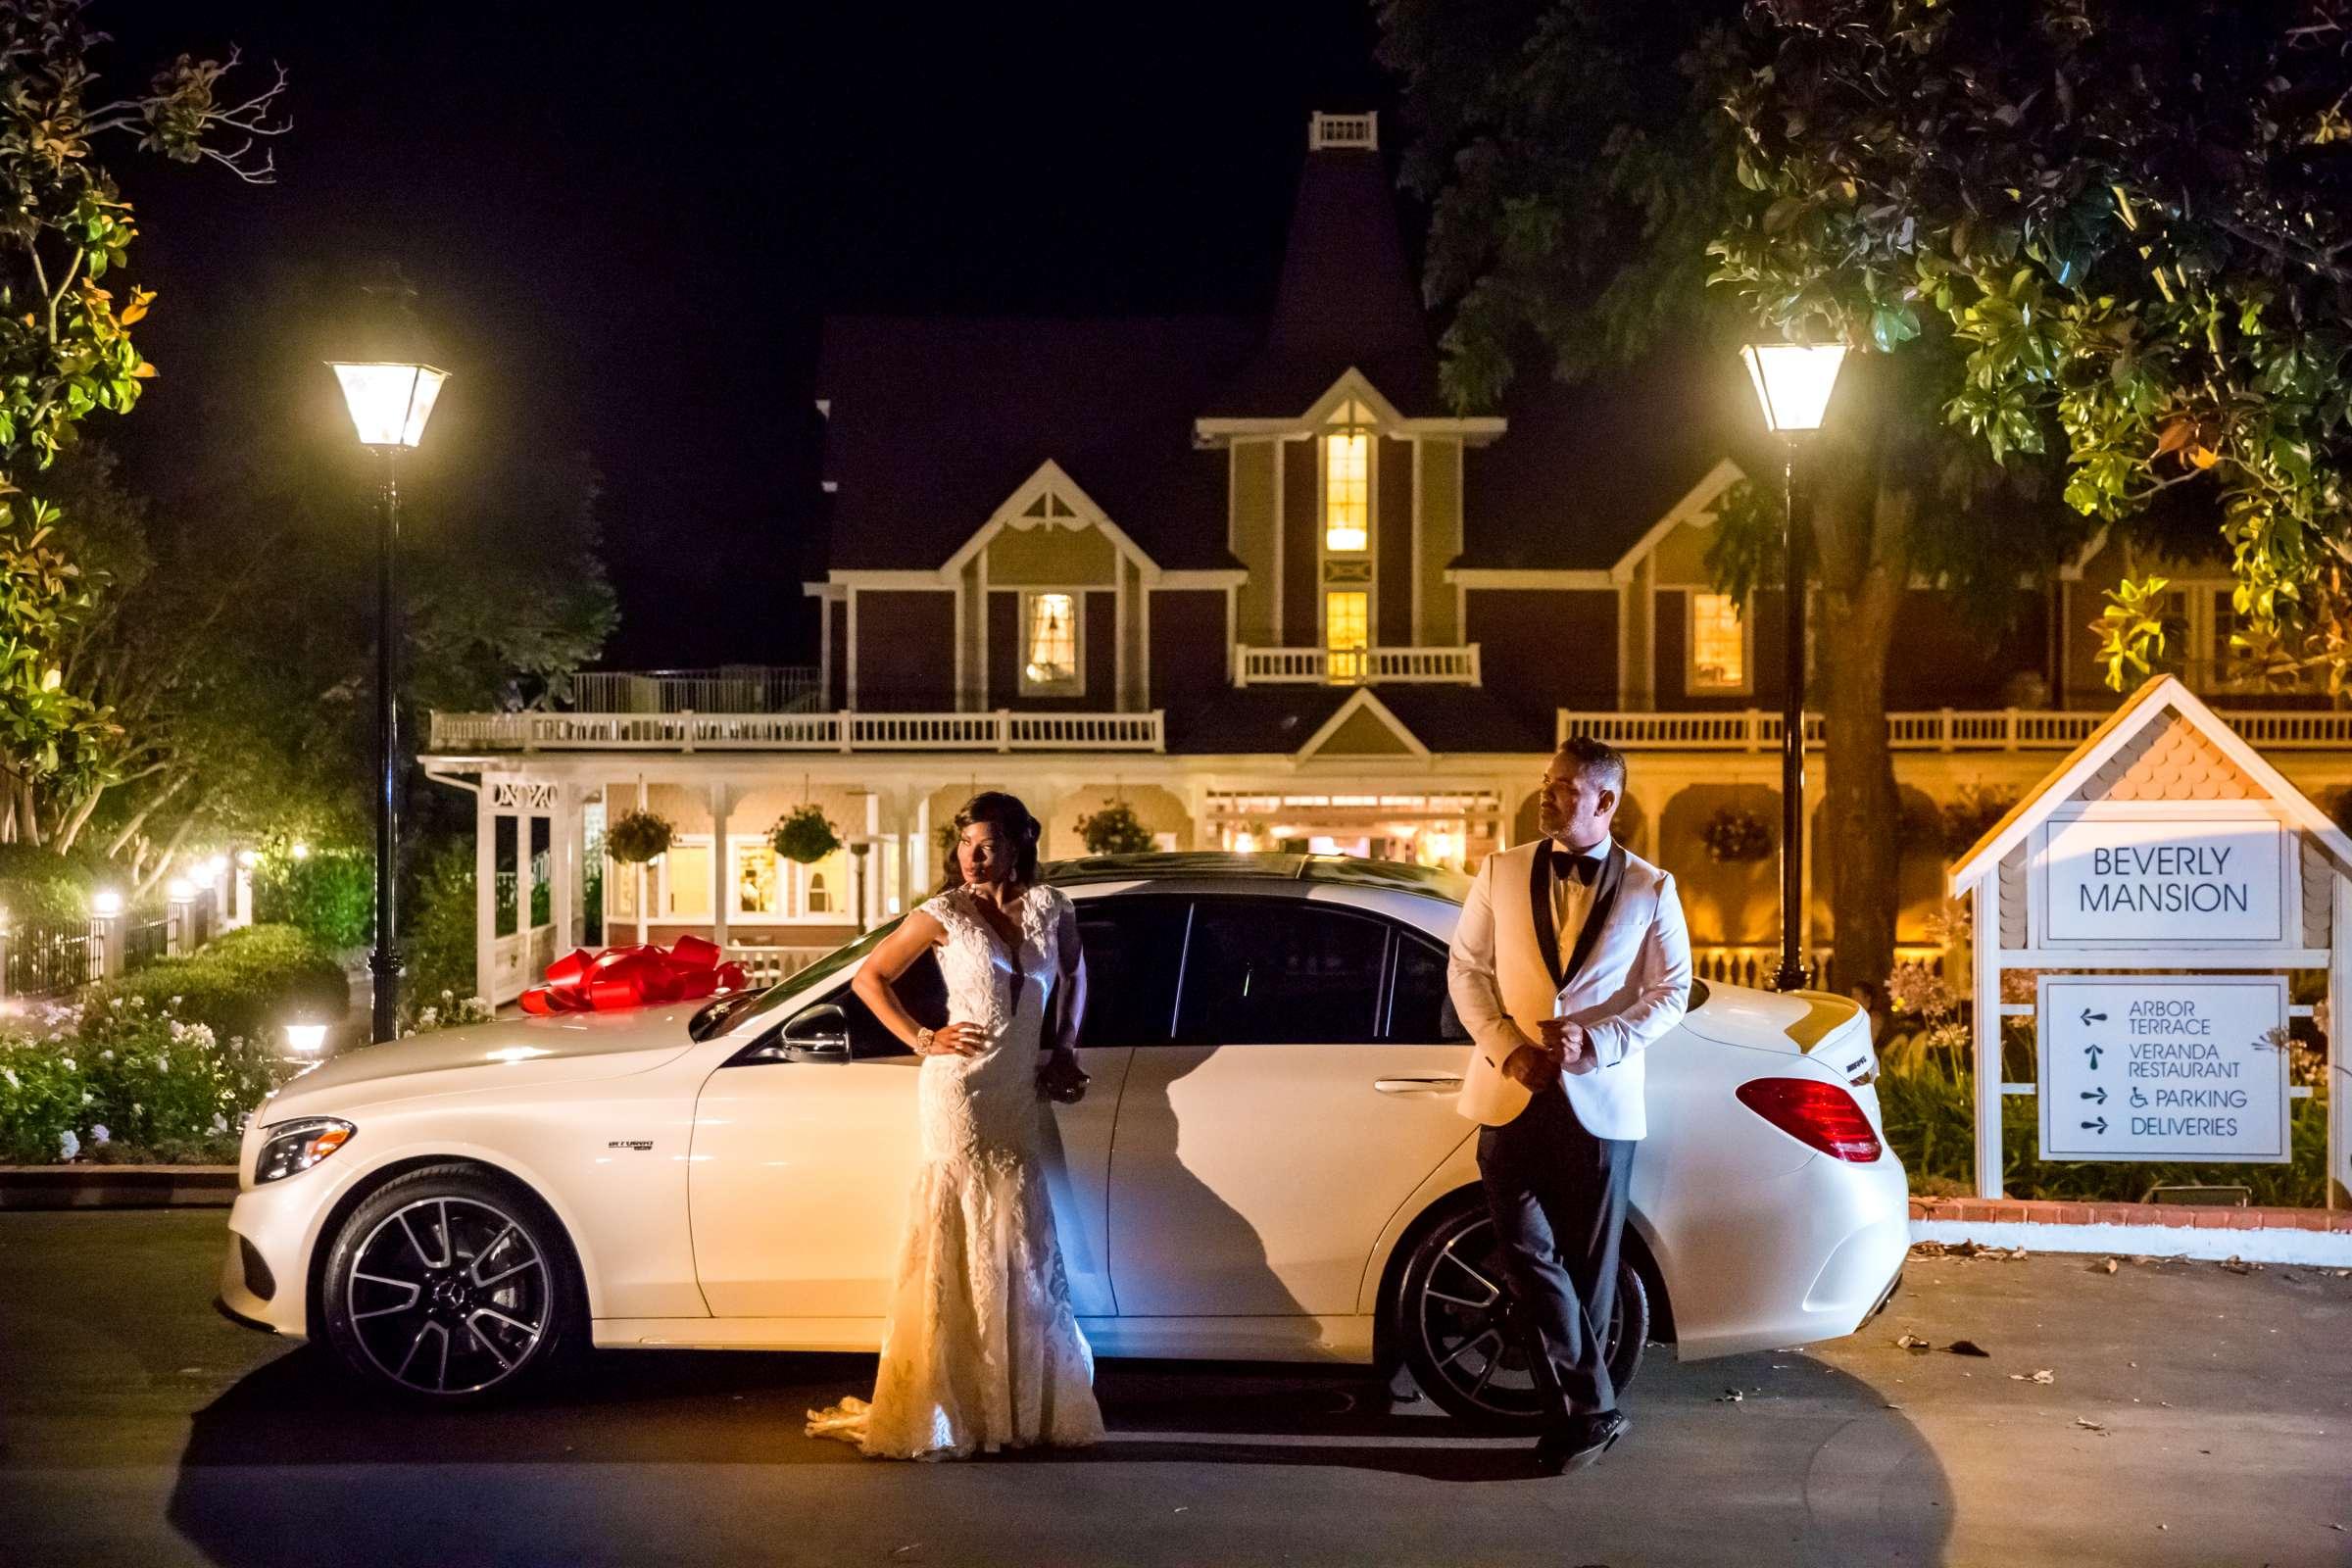 Shantel and Sean Wedding | San Diego Photographer - True Photography